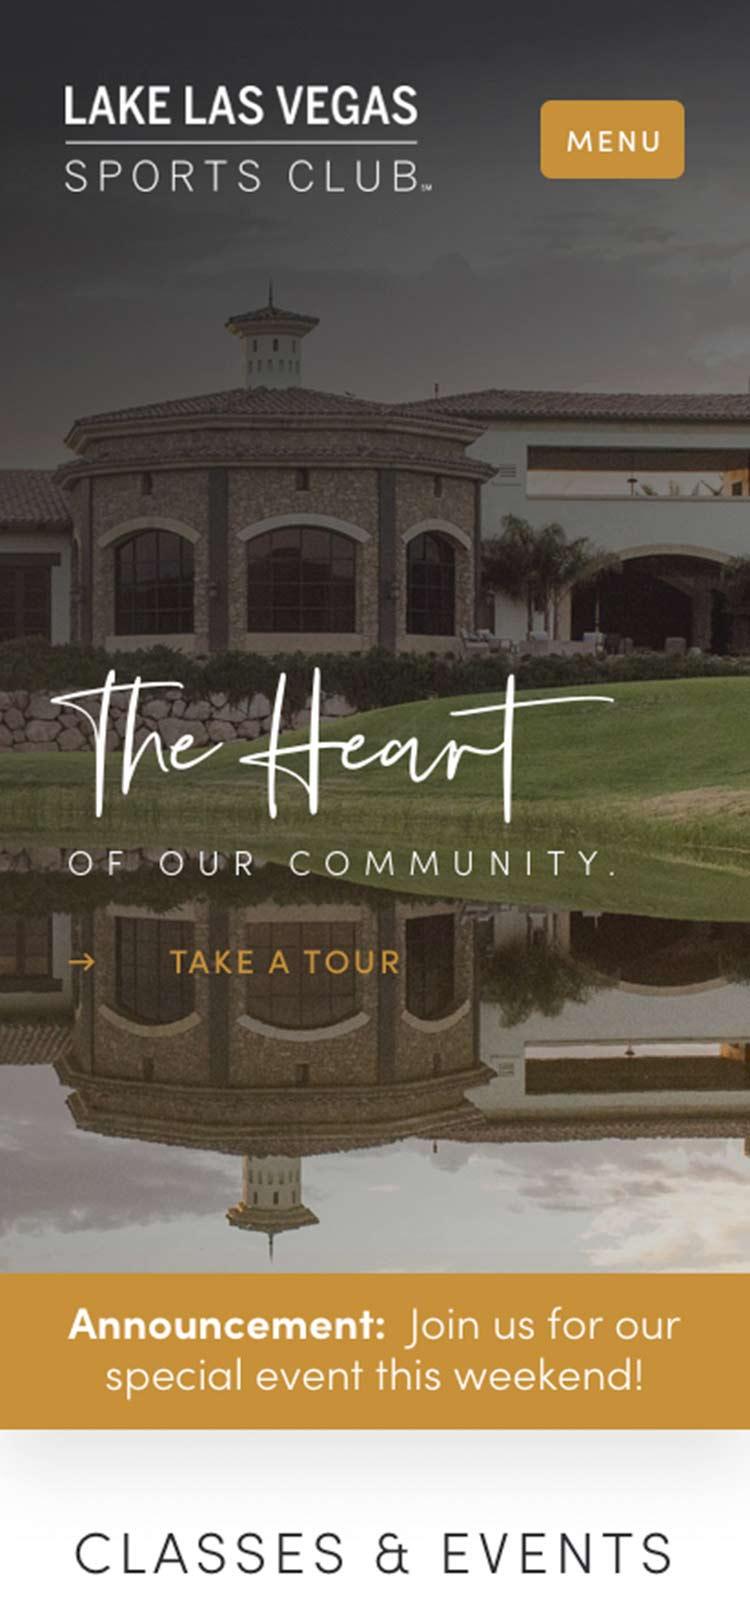 Lake Las Vegas Sports Club mobile website design.